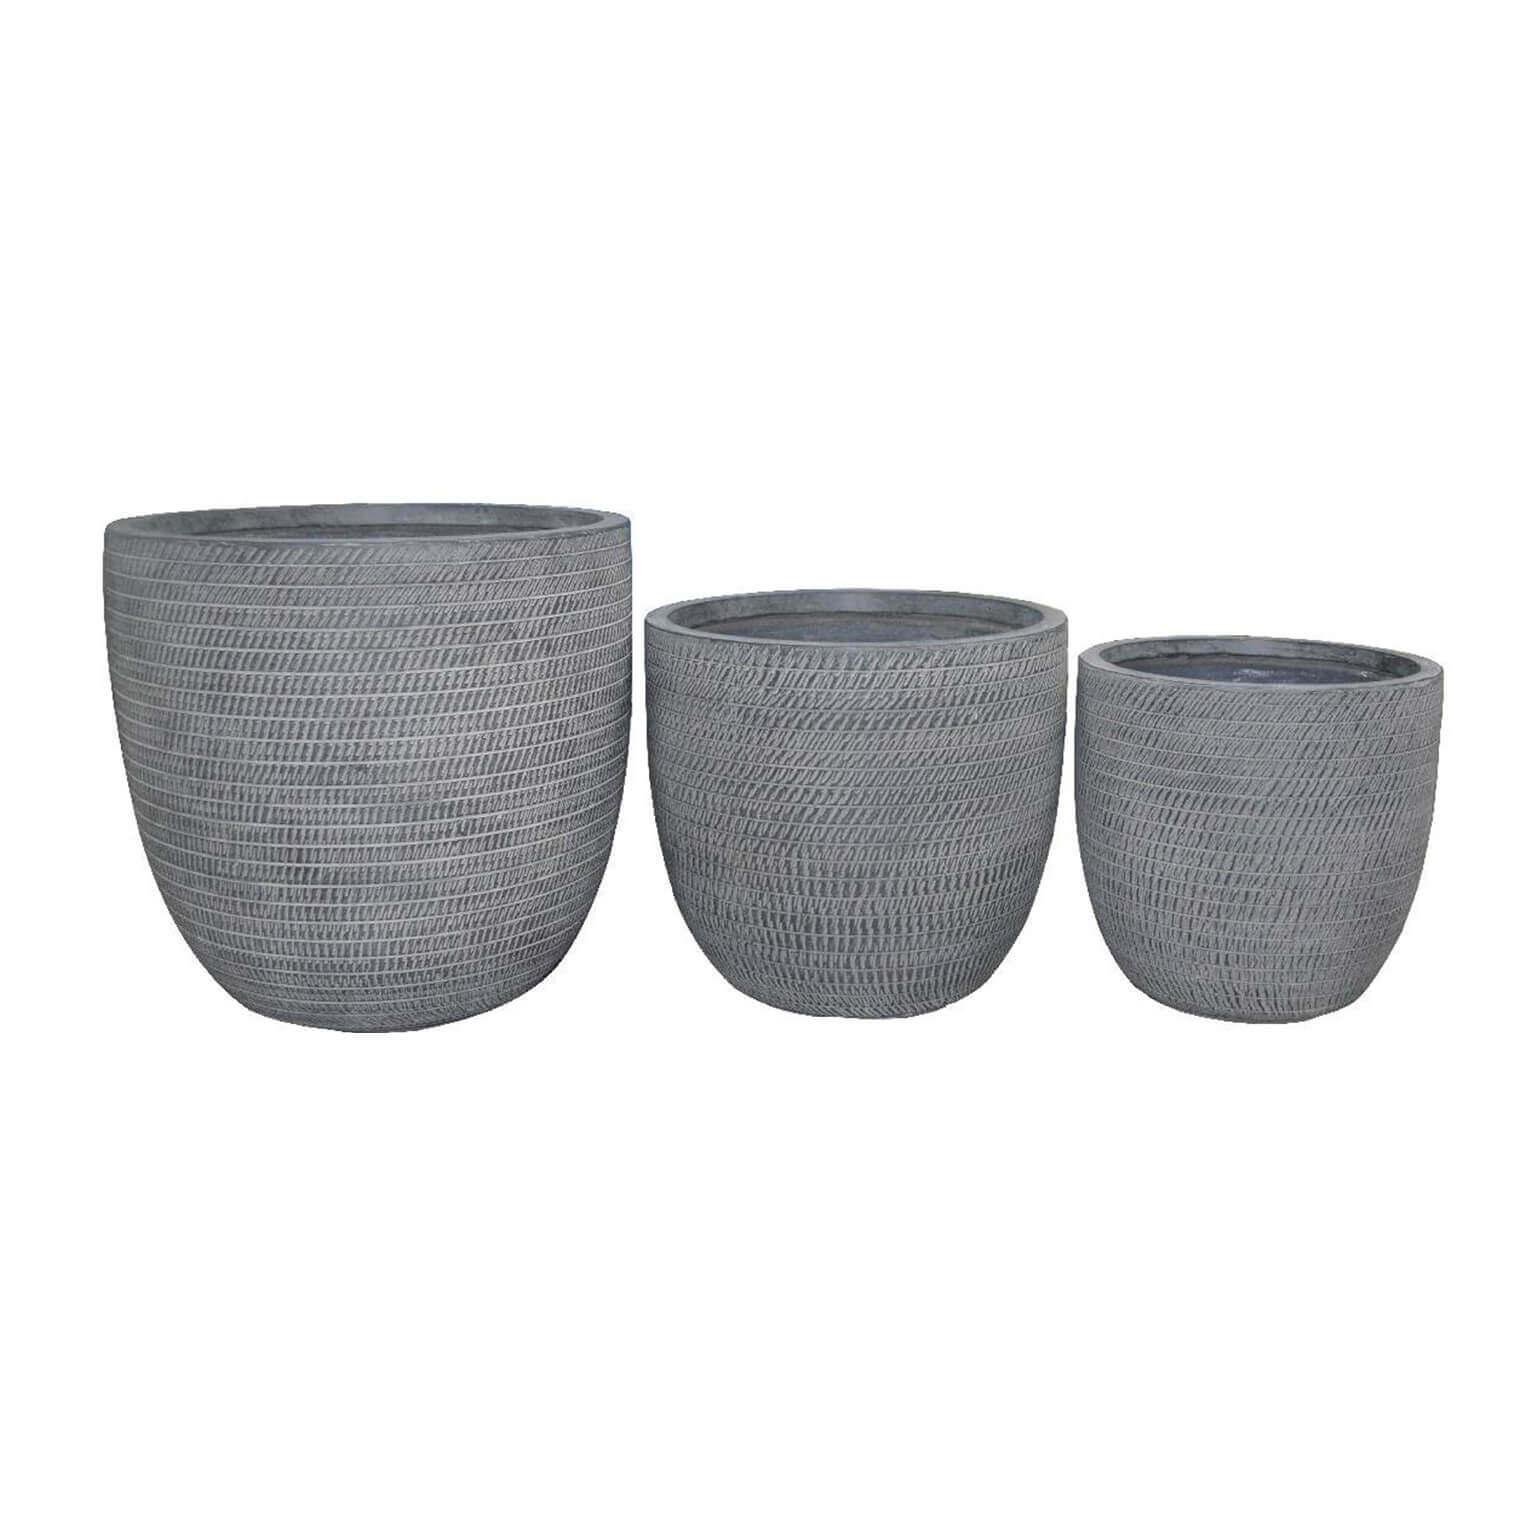 Milani Home ALICIA - set di 3 vasi